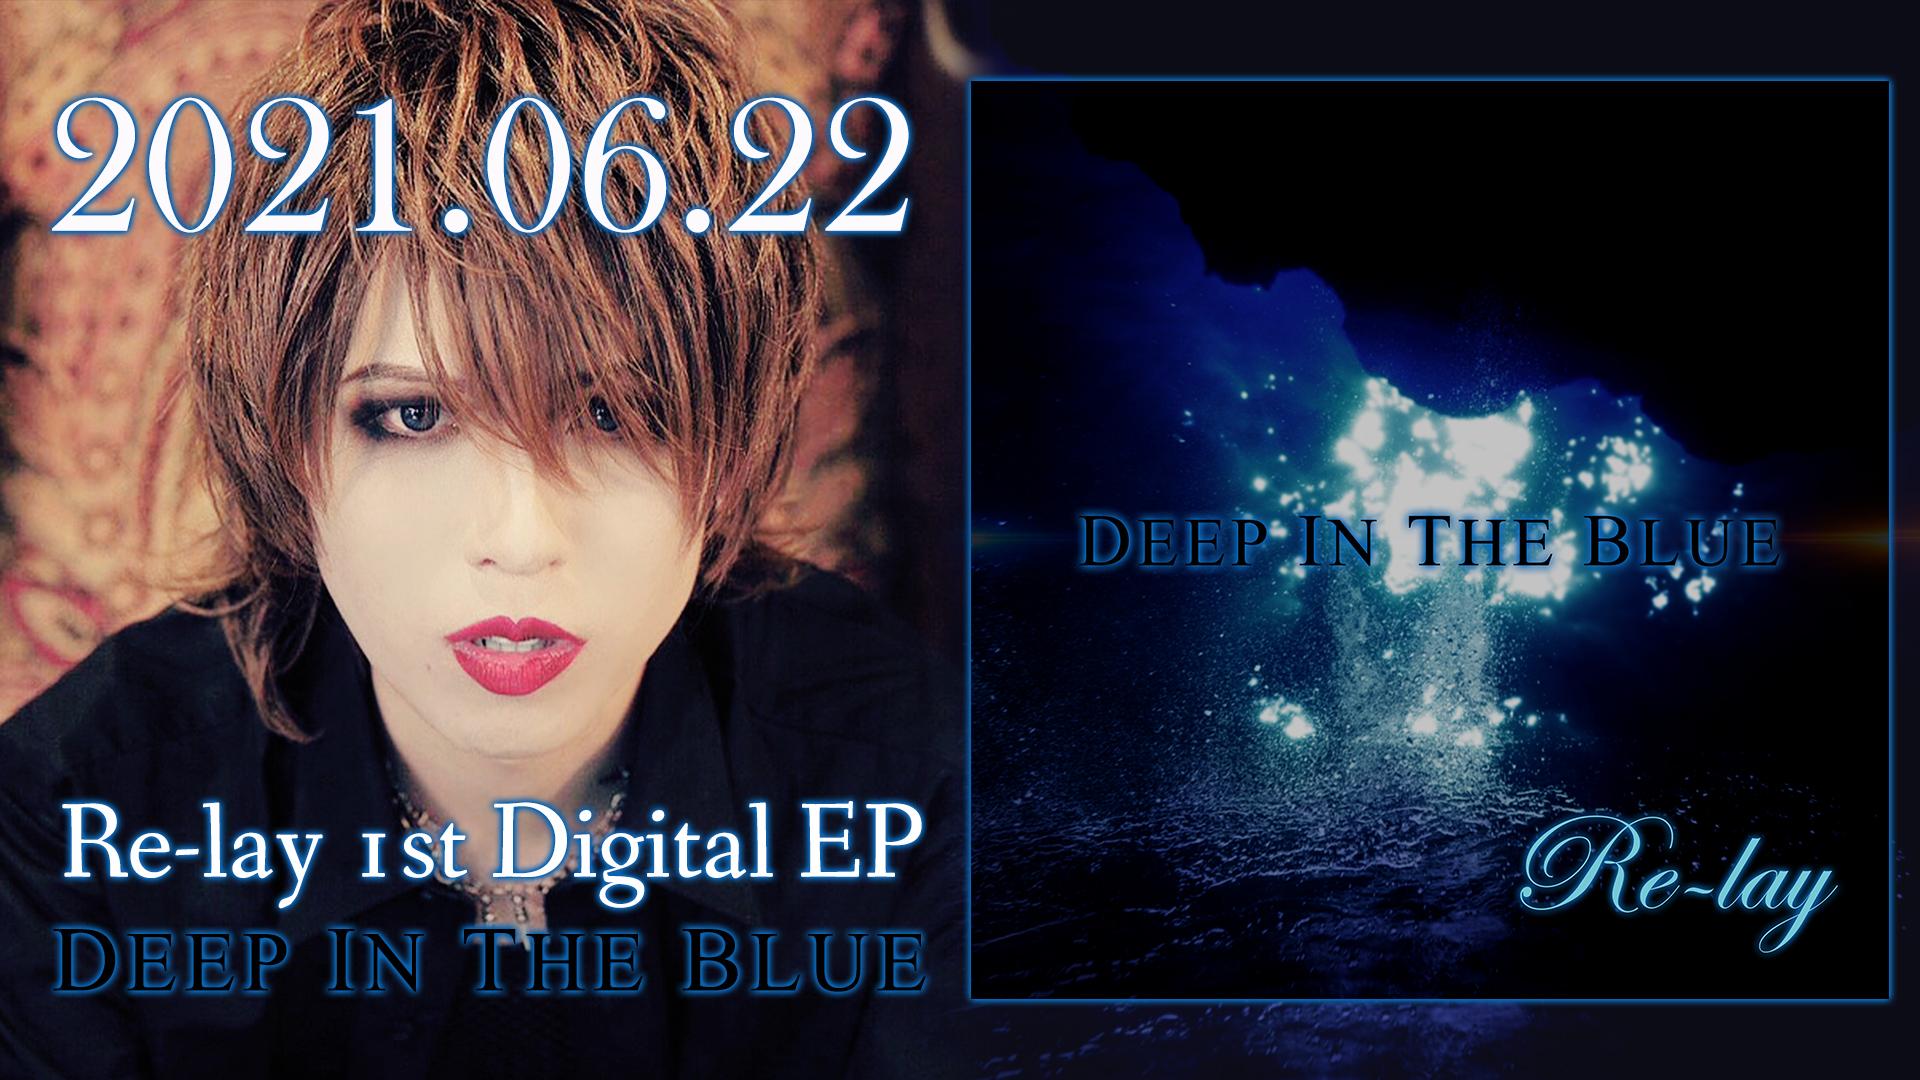 Re-lay 1st Digital EP「DEEP IN THE BLUE」2021.06.22配信スタート!